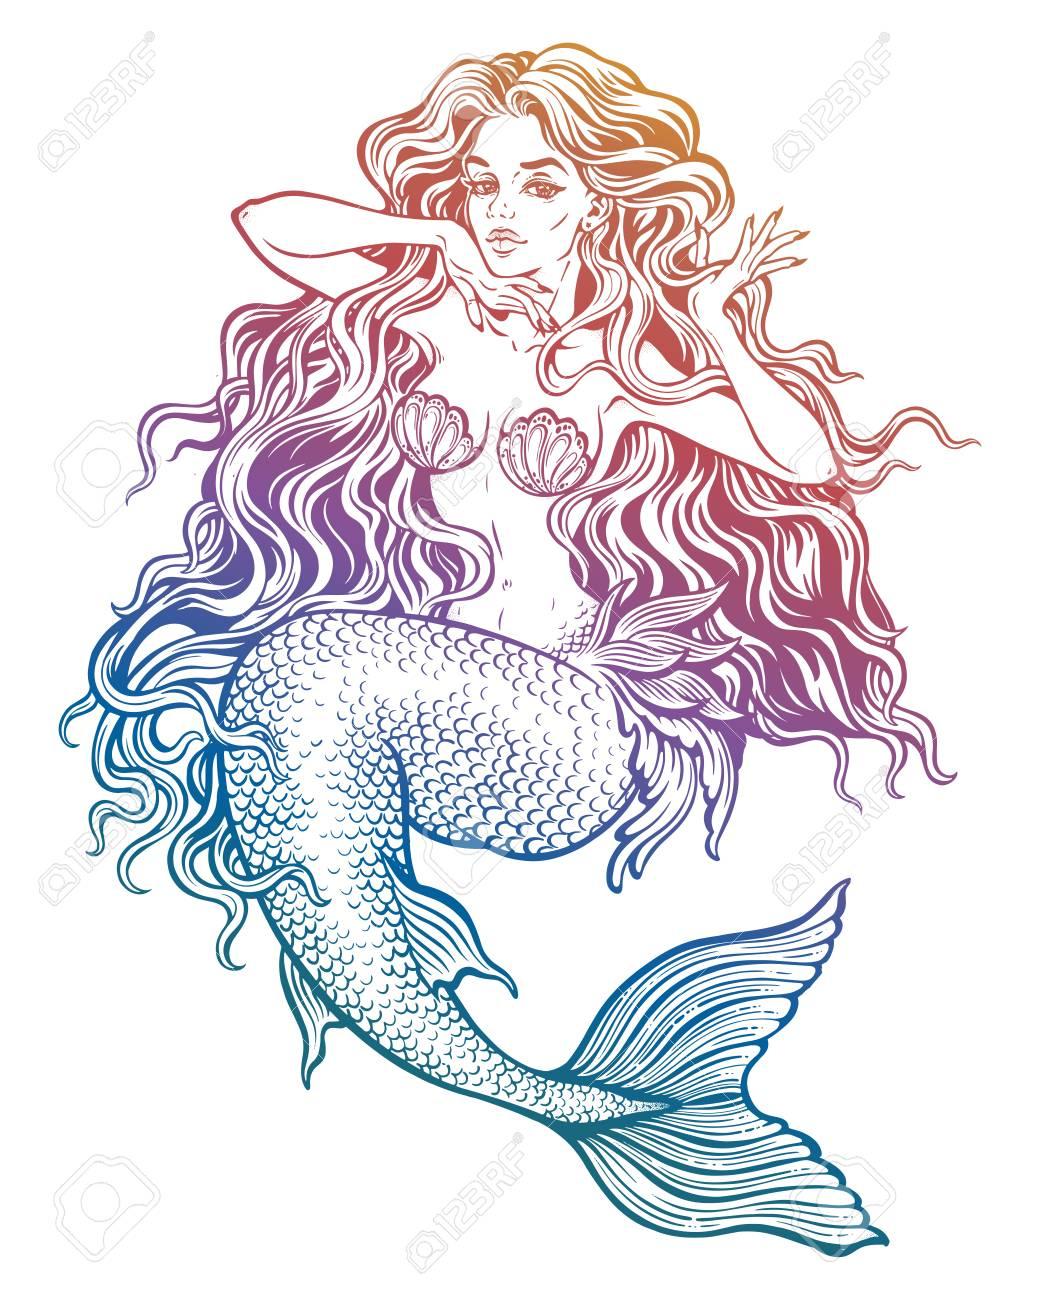 1040x1300 Beautiful Mermaid Girl With Fairytale Hair Art. Royalty Free